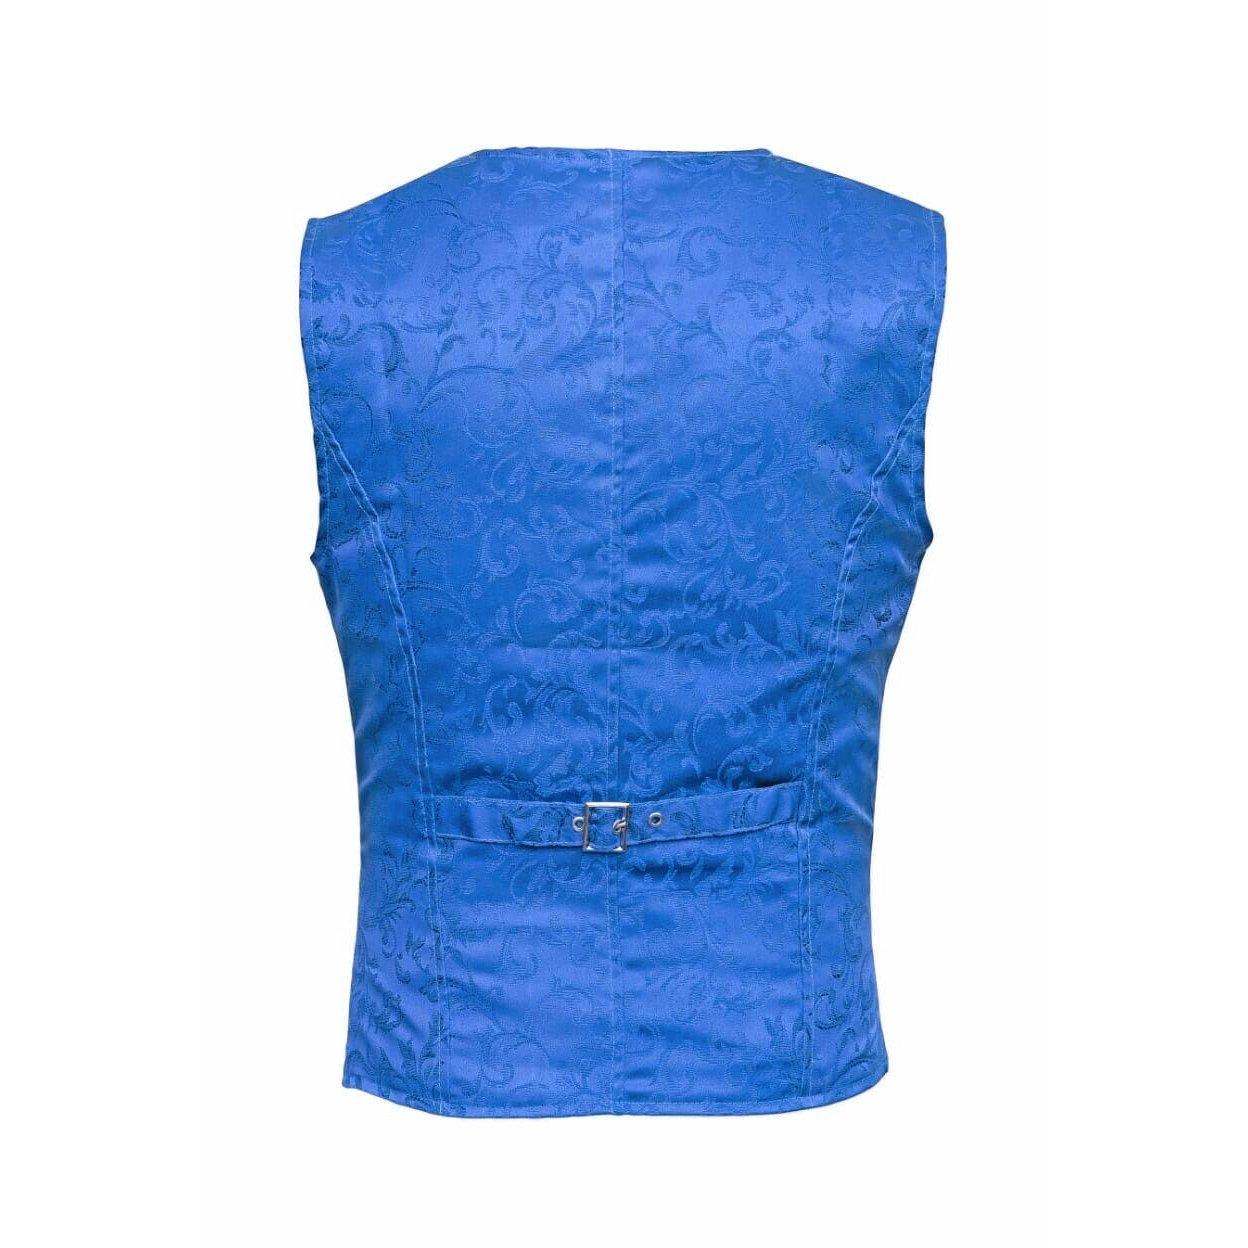 DARKROCK Waistcoat Gothic Steampunk Royal Blue Vest(back)